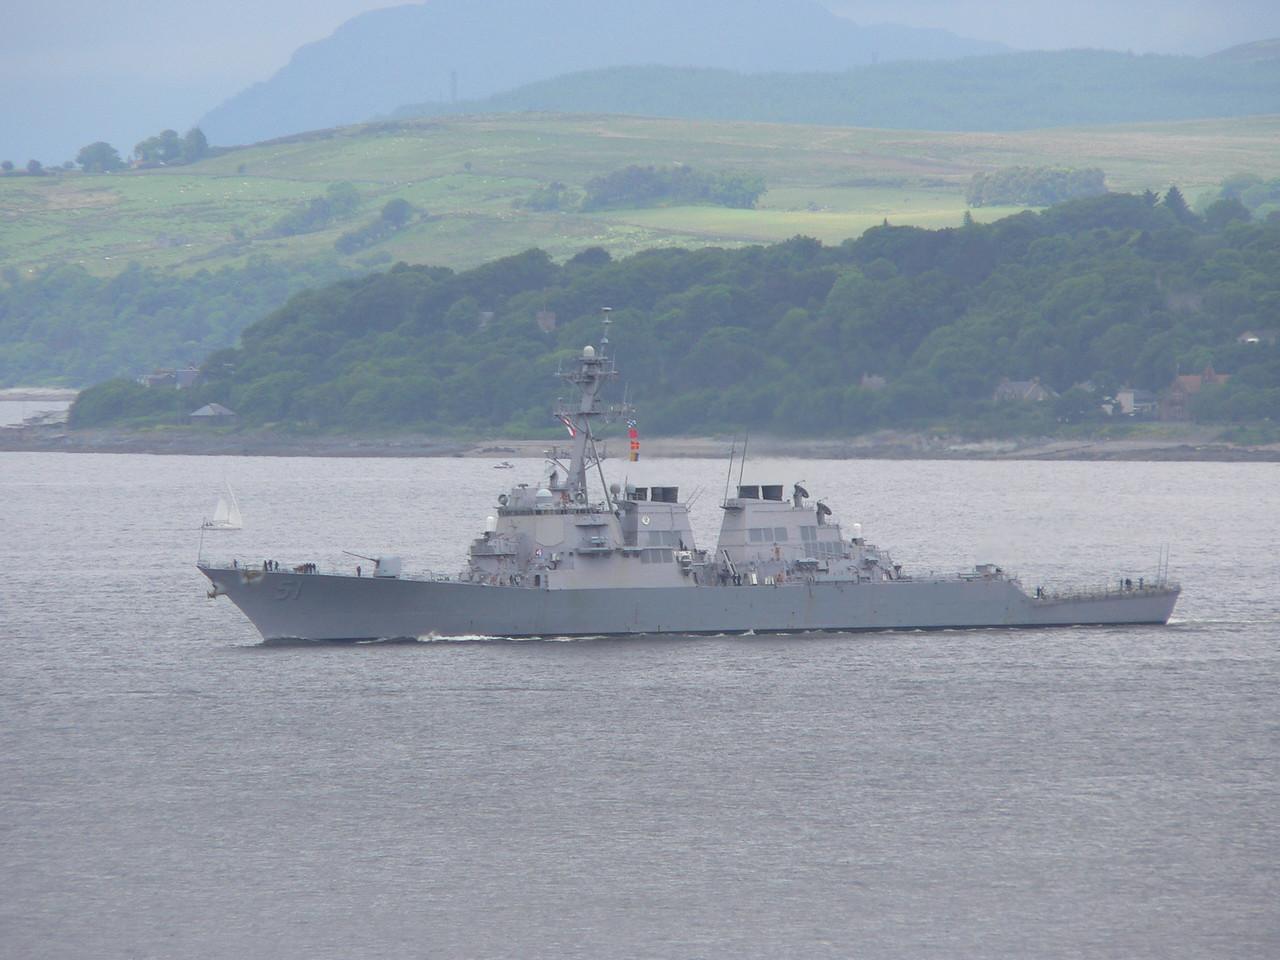 DDG-51 USS ARLEIGH BURKE